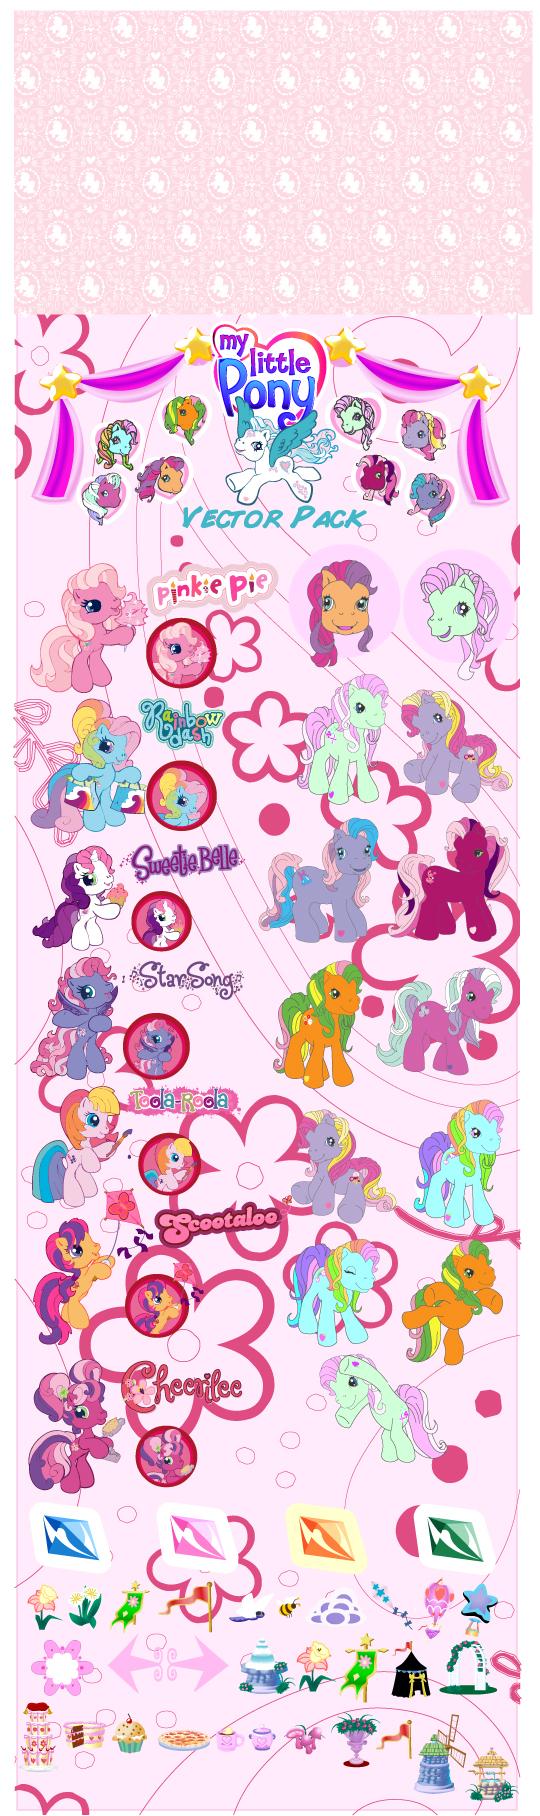 540x1816 My Little Pony Cartoon Clip Art Free Vector 4vector